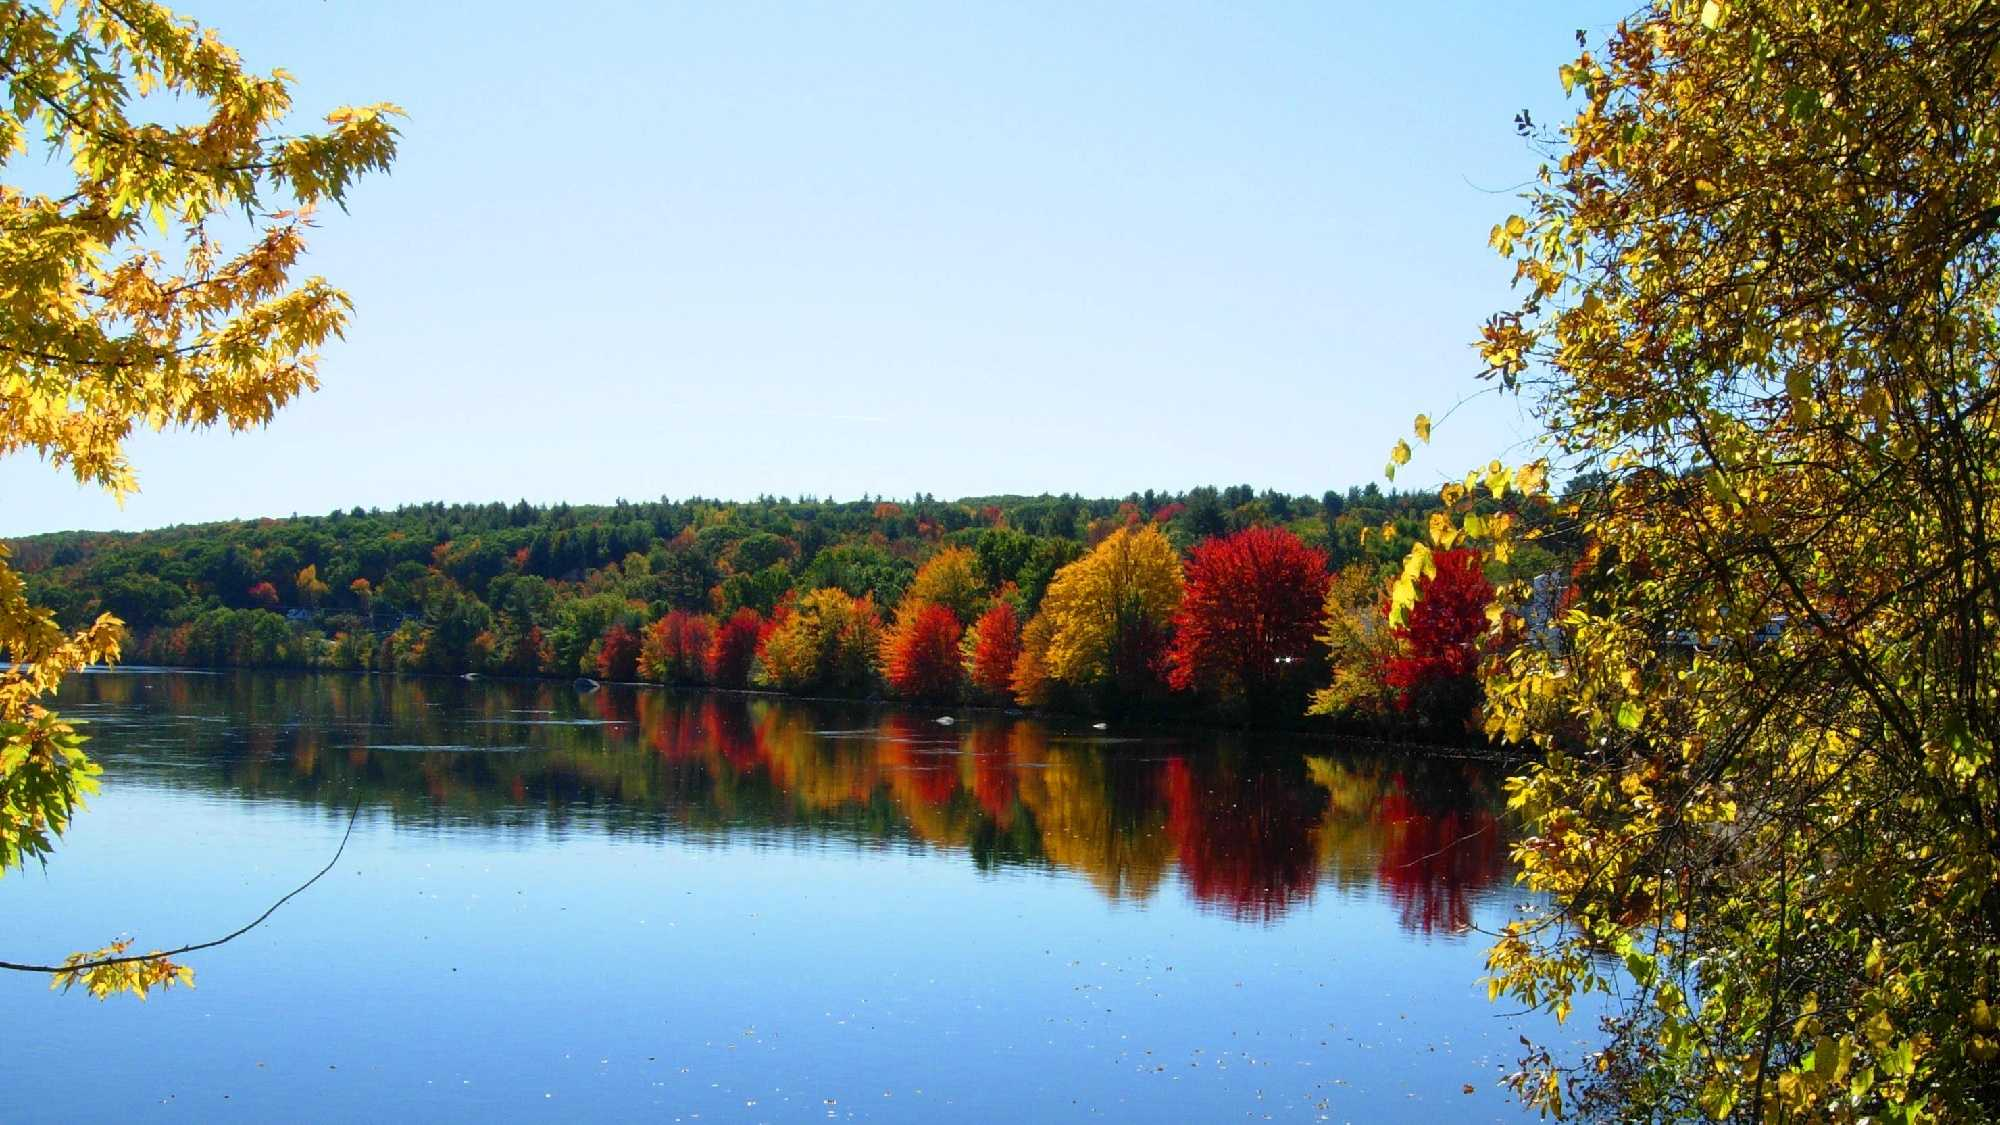 The Merrimack River